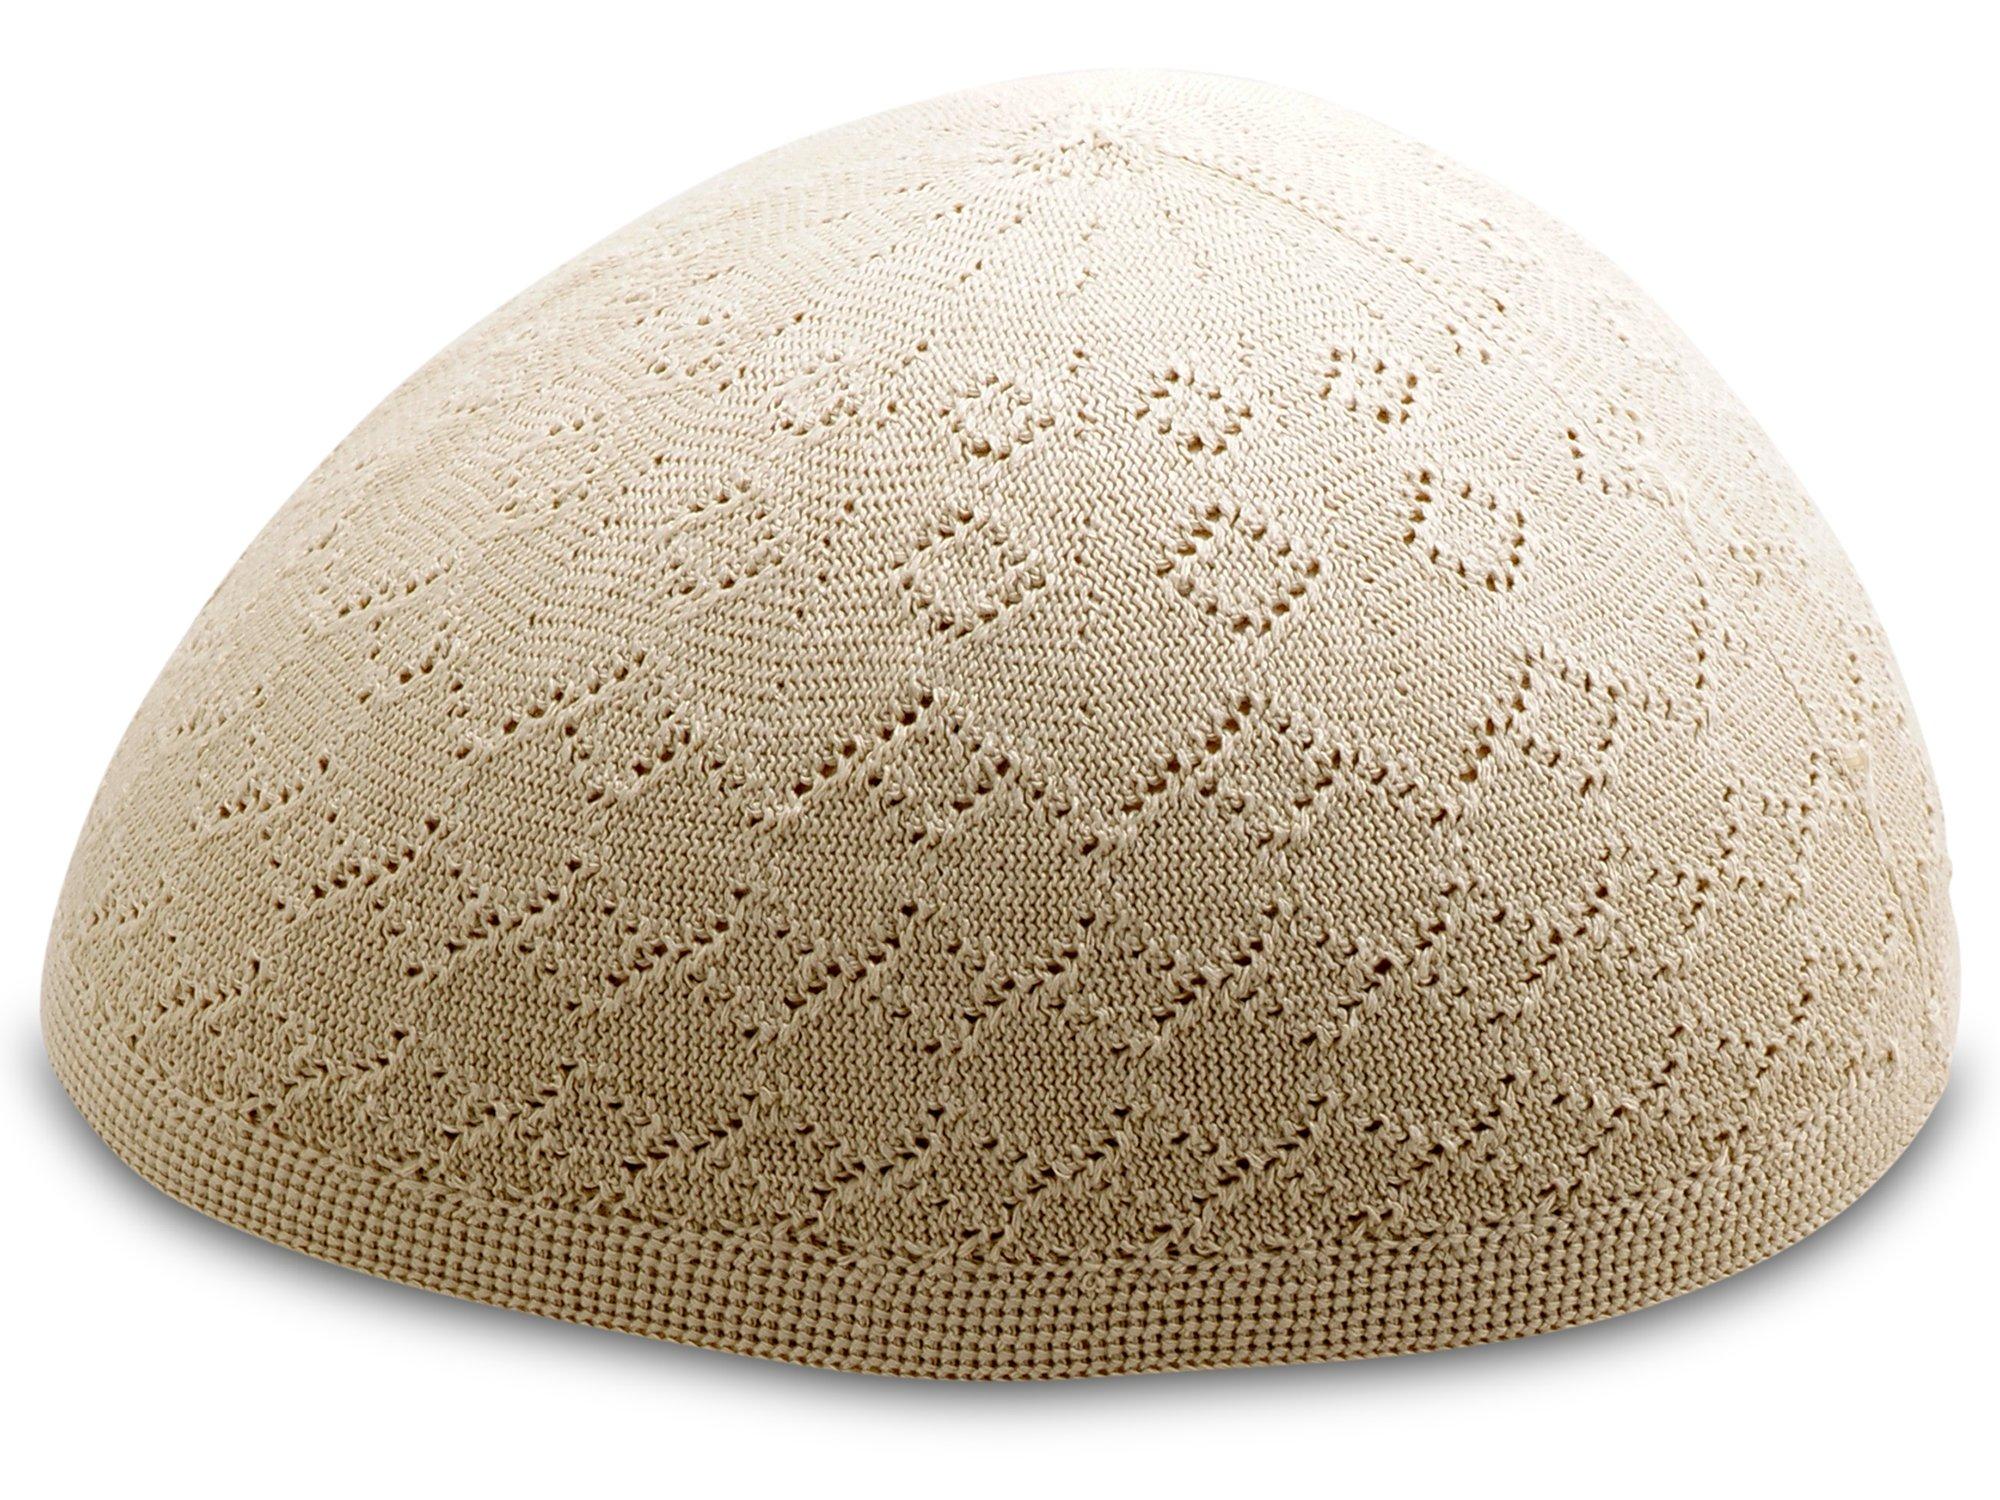 48f33d486c490 Muslim Bookmark Light Weight Turkish Cotton Crochet Kufi